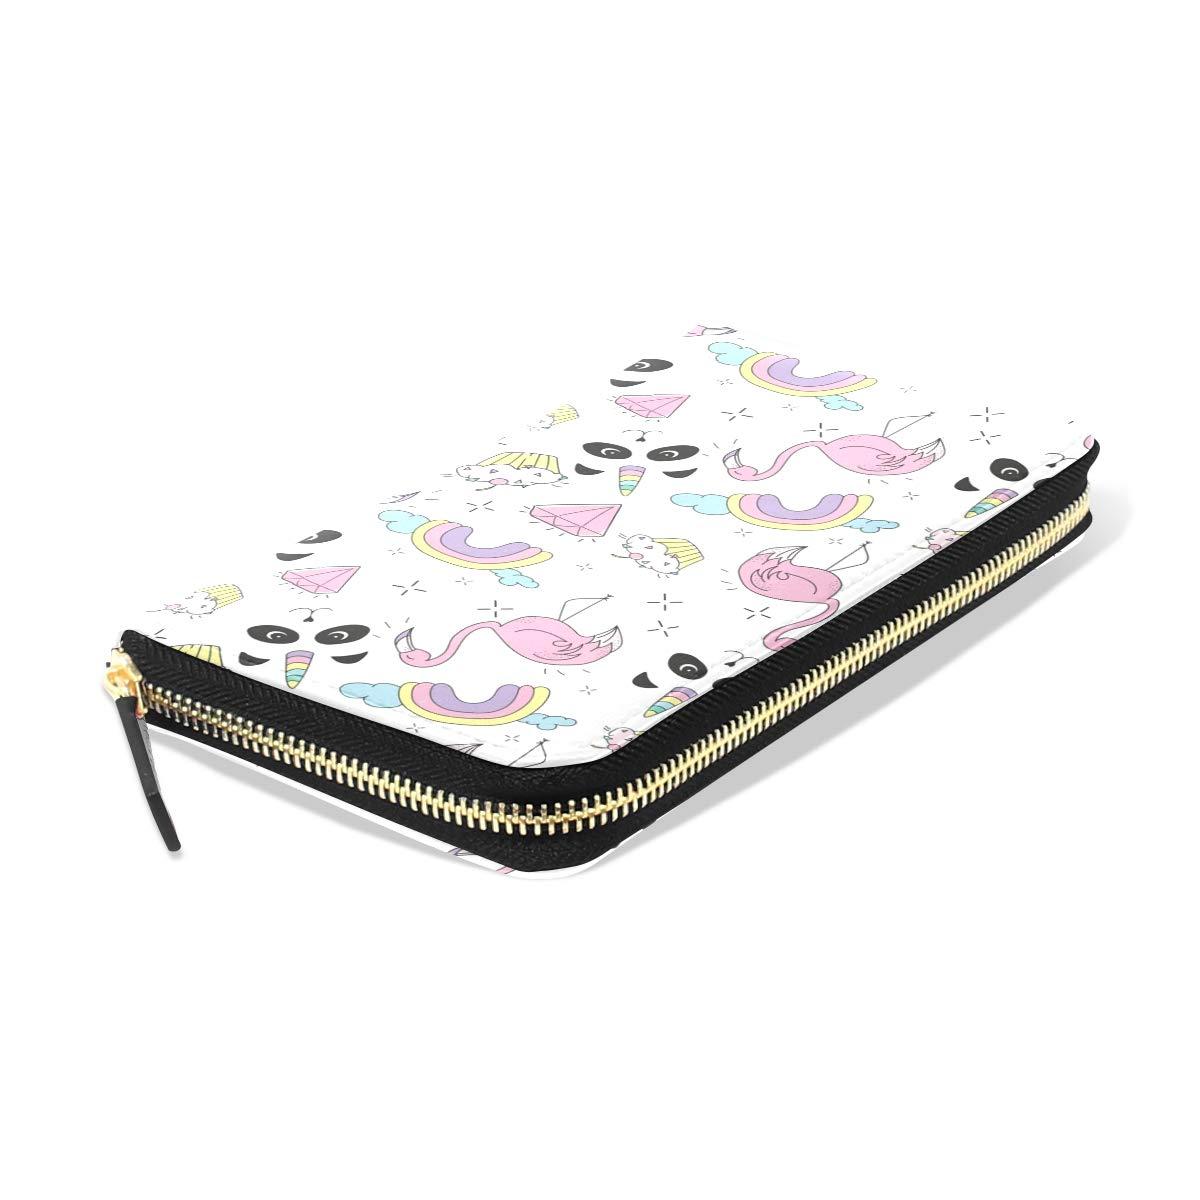 Women LeatherCreative Colorful Art FlamingoWallet Large Capacity Zipper Travel Wristlet Bags Clutch Cellphone Bag